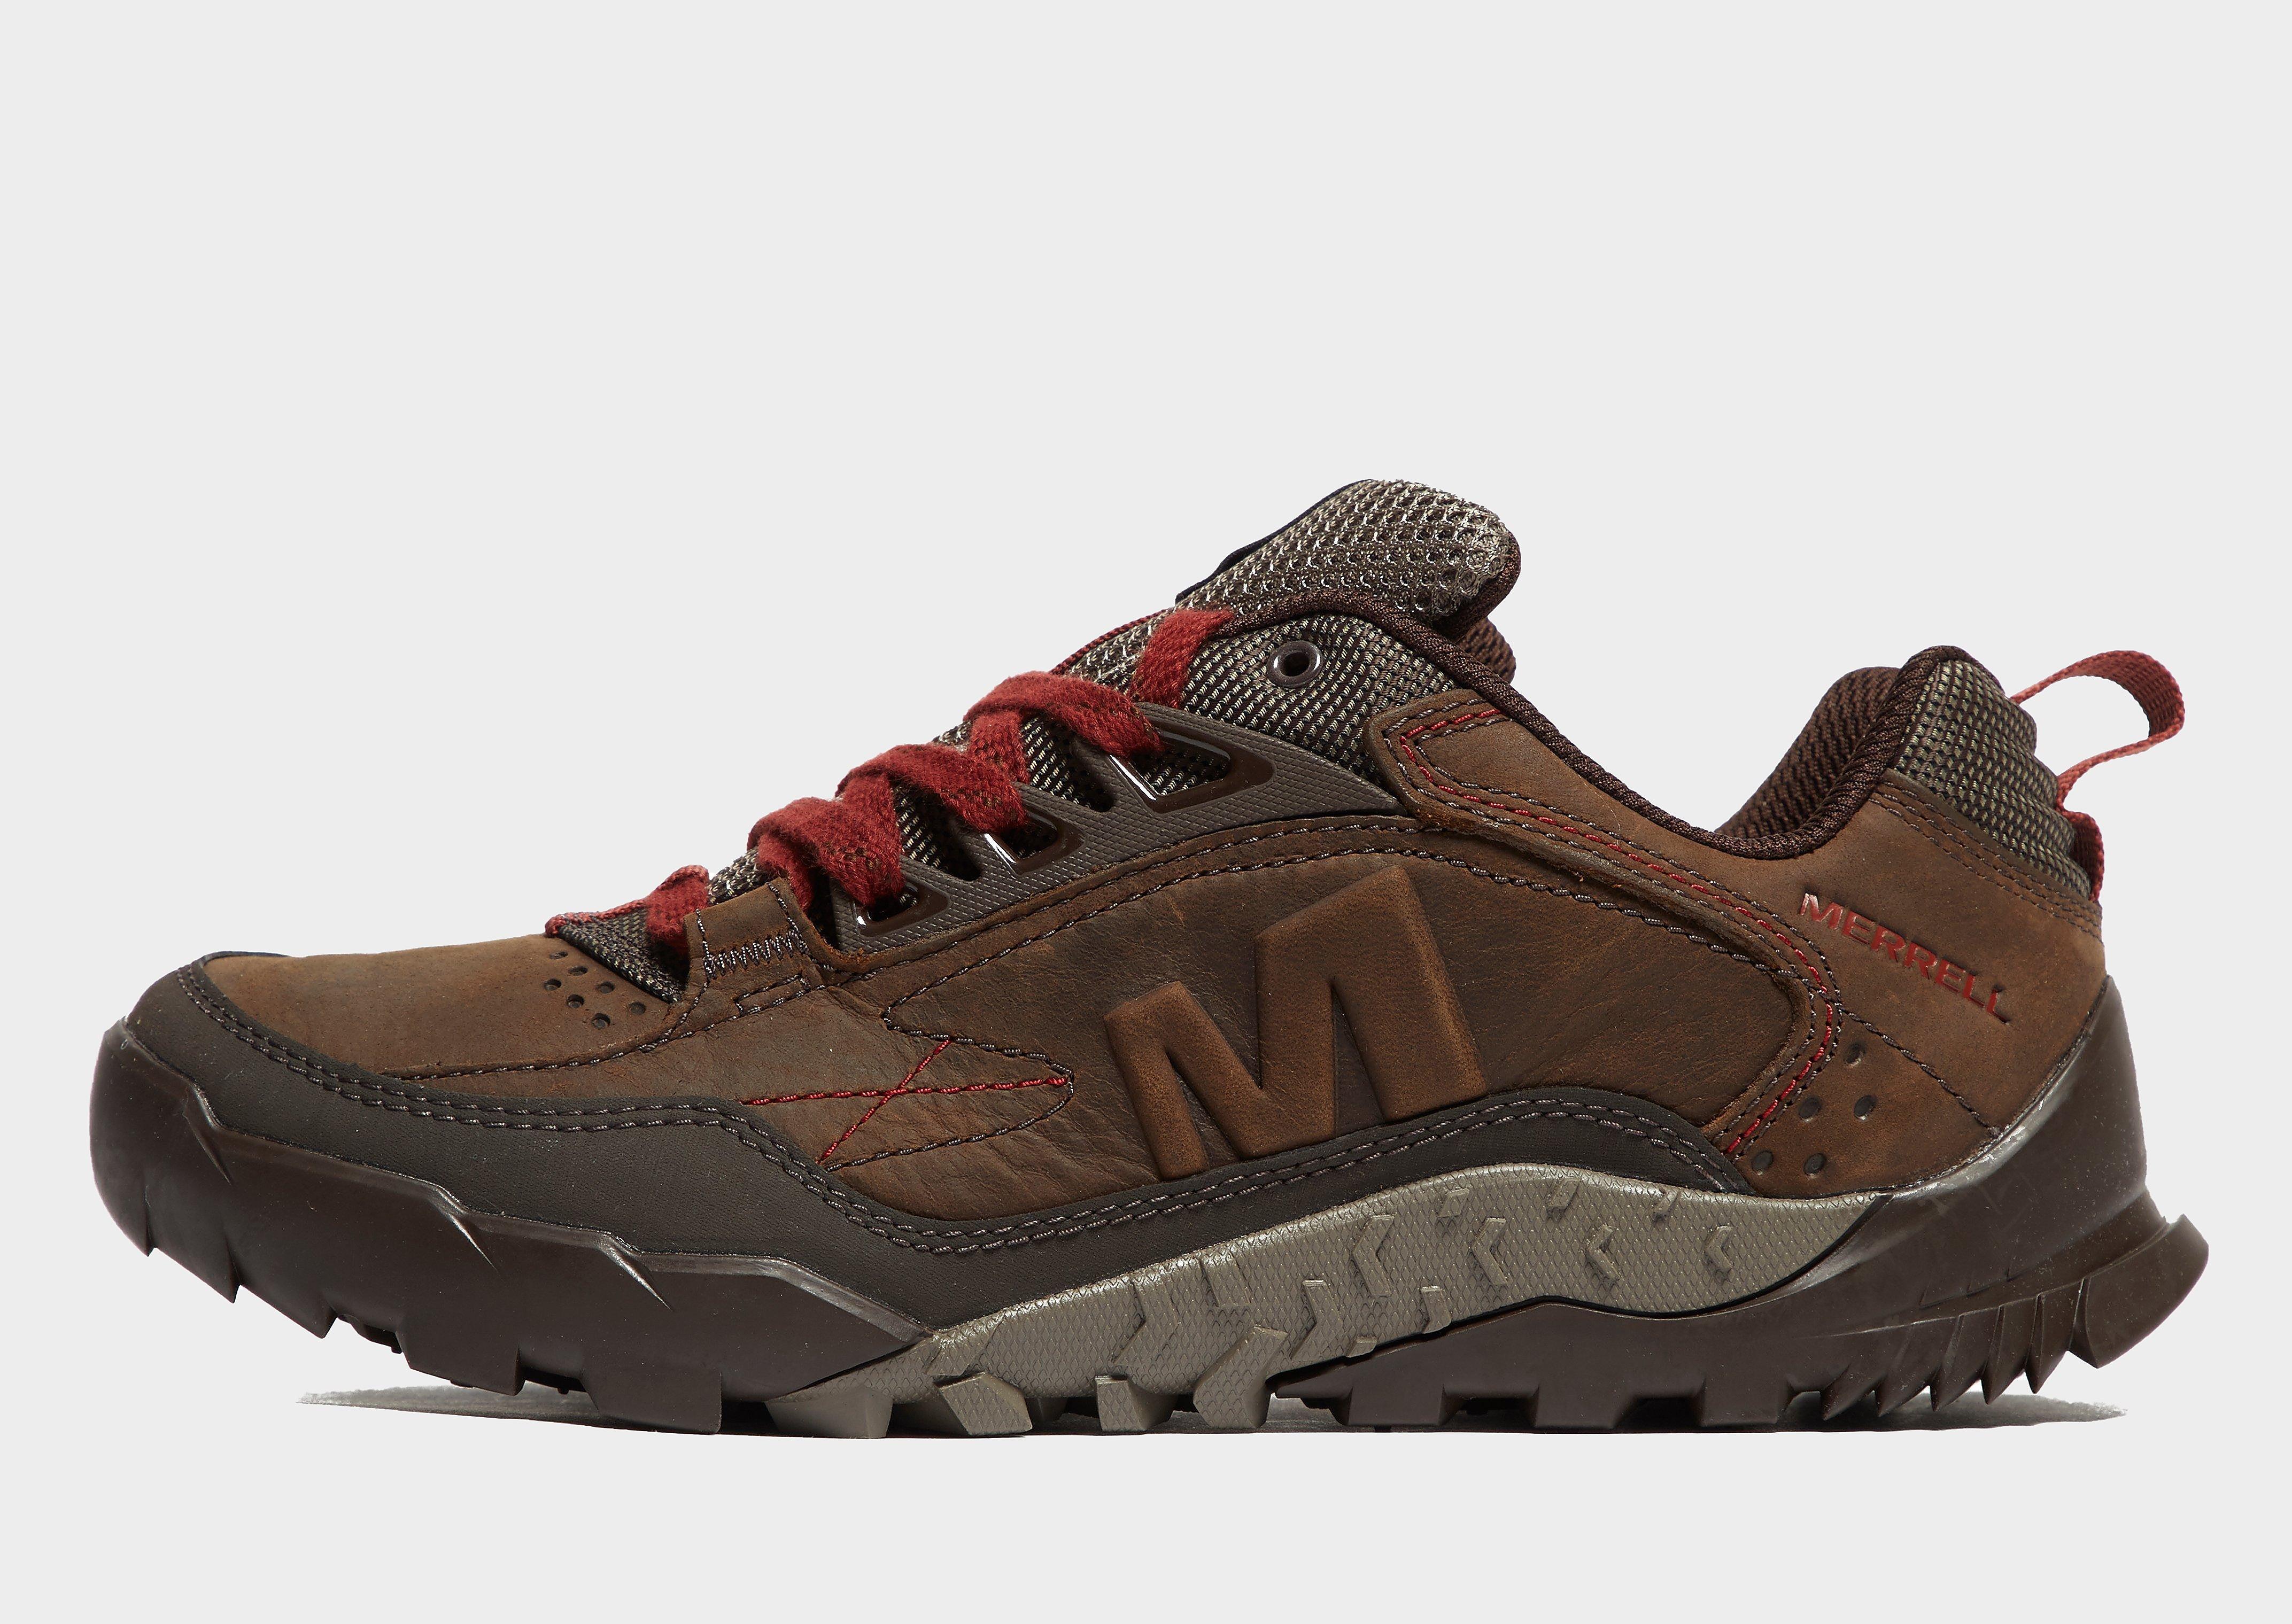 Merrell Men's Annex Track Low Shoes